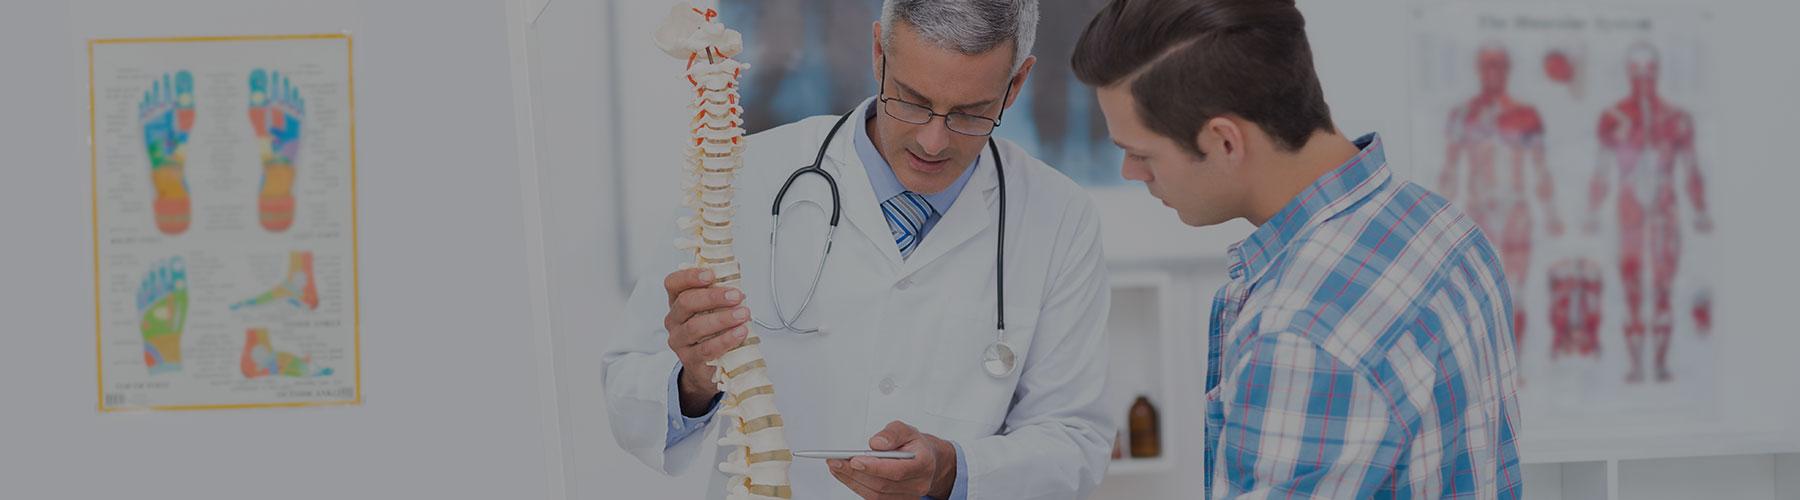 header-1800x500-doctor-spine | Cedars-Sinai Kerlan-Jobe